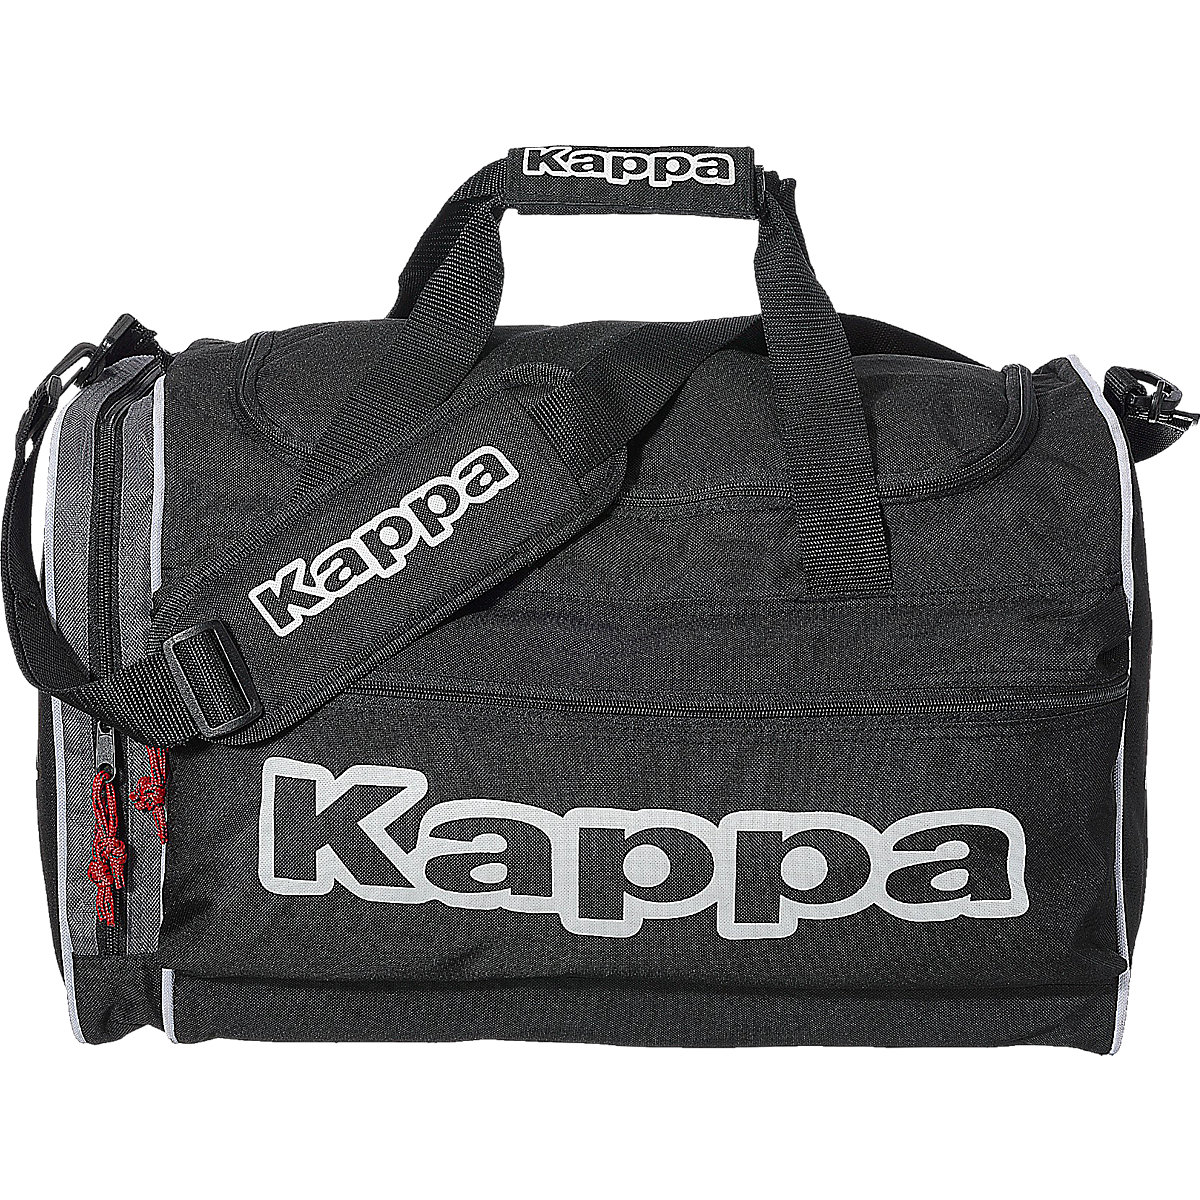 kappa kinder sporttasche greece 42 l schwarz mirapodo. Black Bedroom Furniture Sets. Home Design Ideas